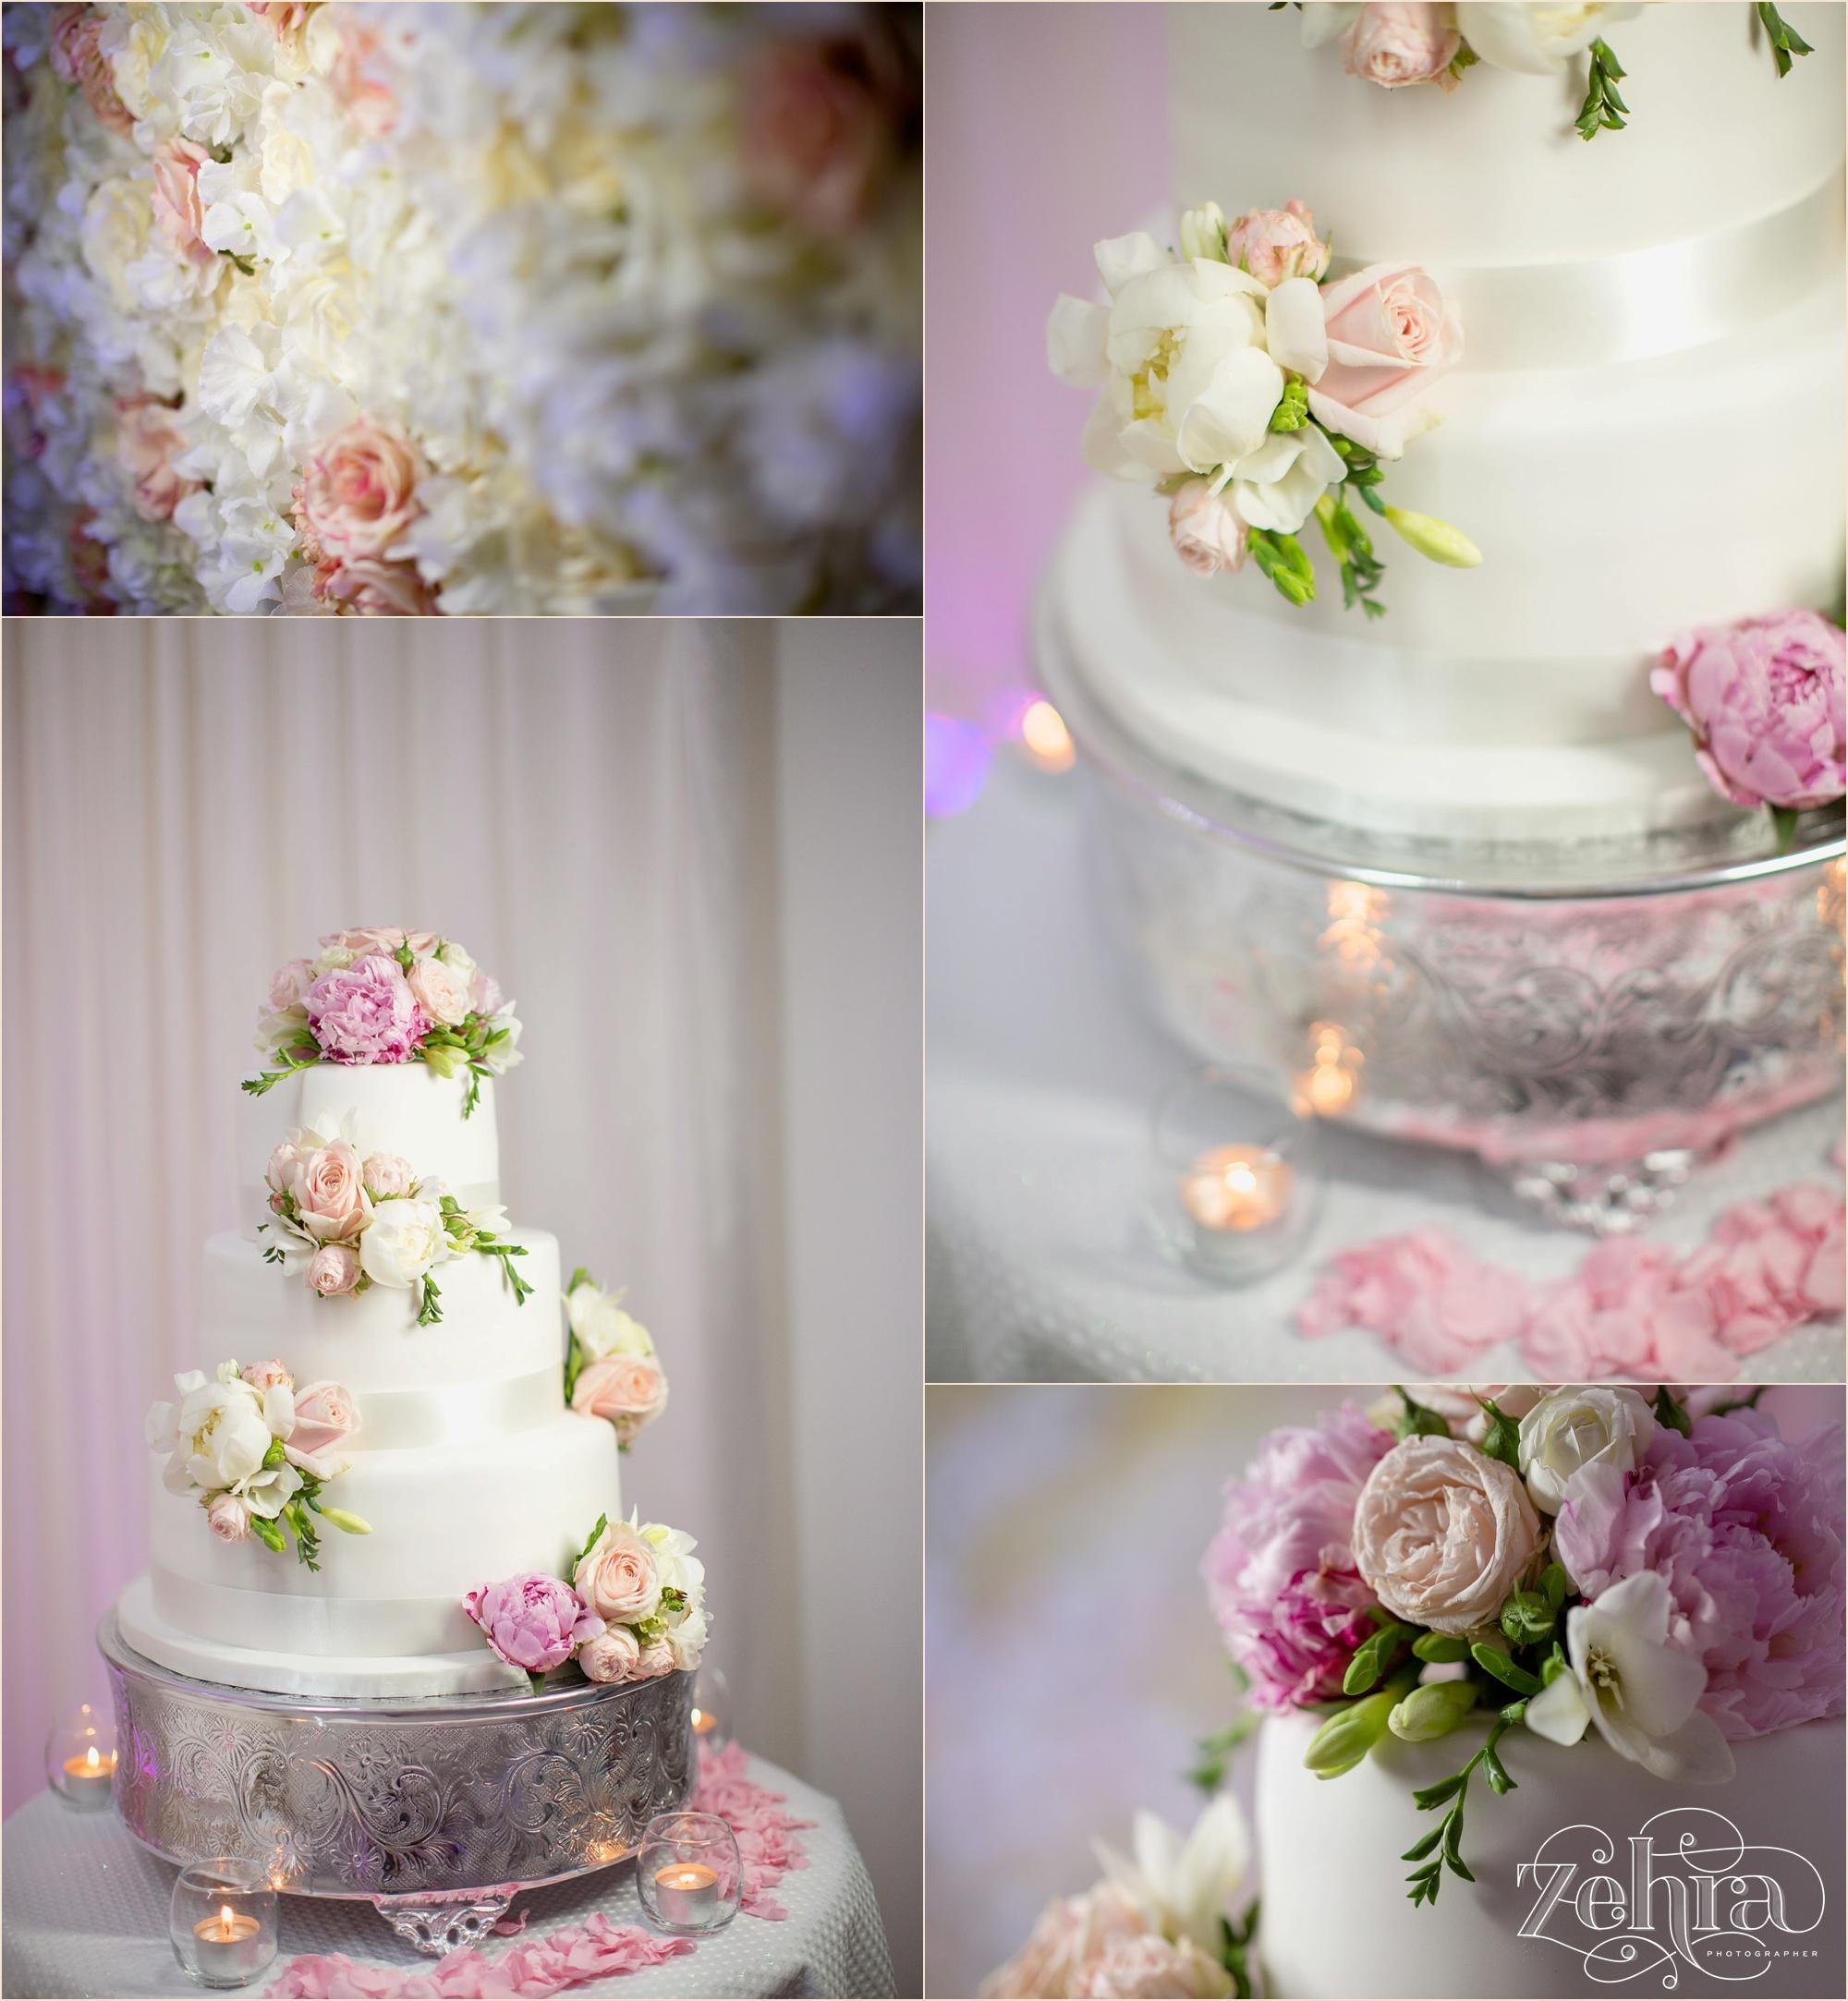 jasira manchester wedding photographer_0033.jpg